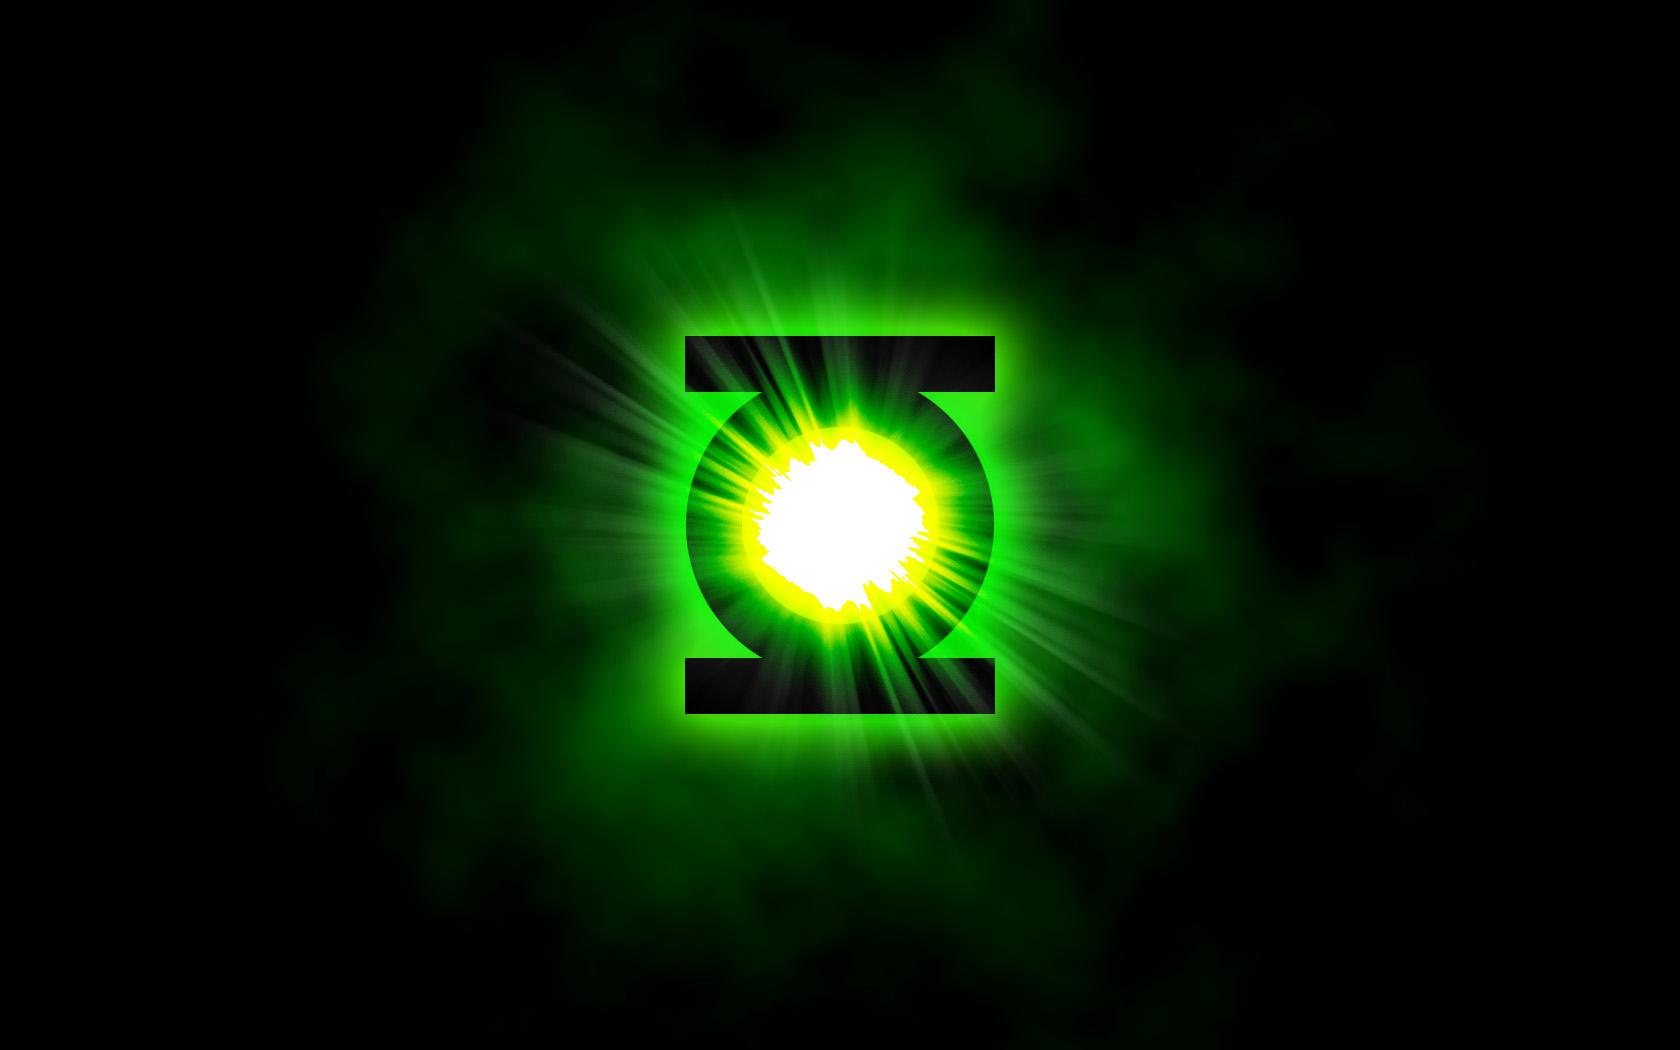 Green Lantern Computer Wallpapers Desktop Backgrounds 1680x1050 1680x1050